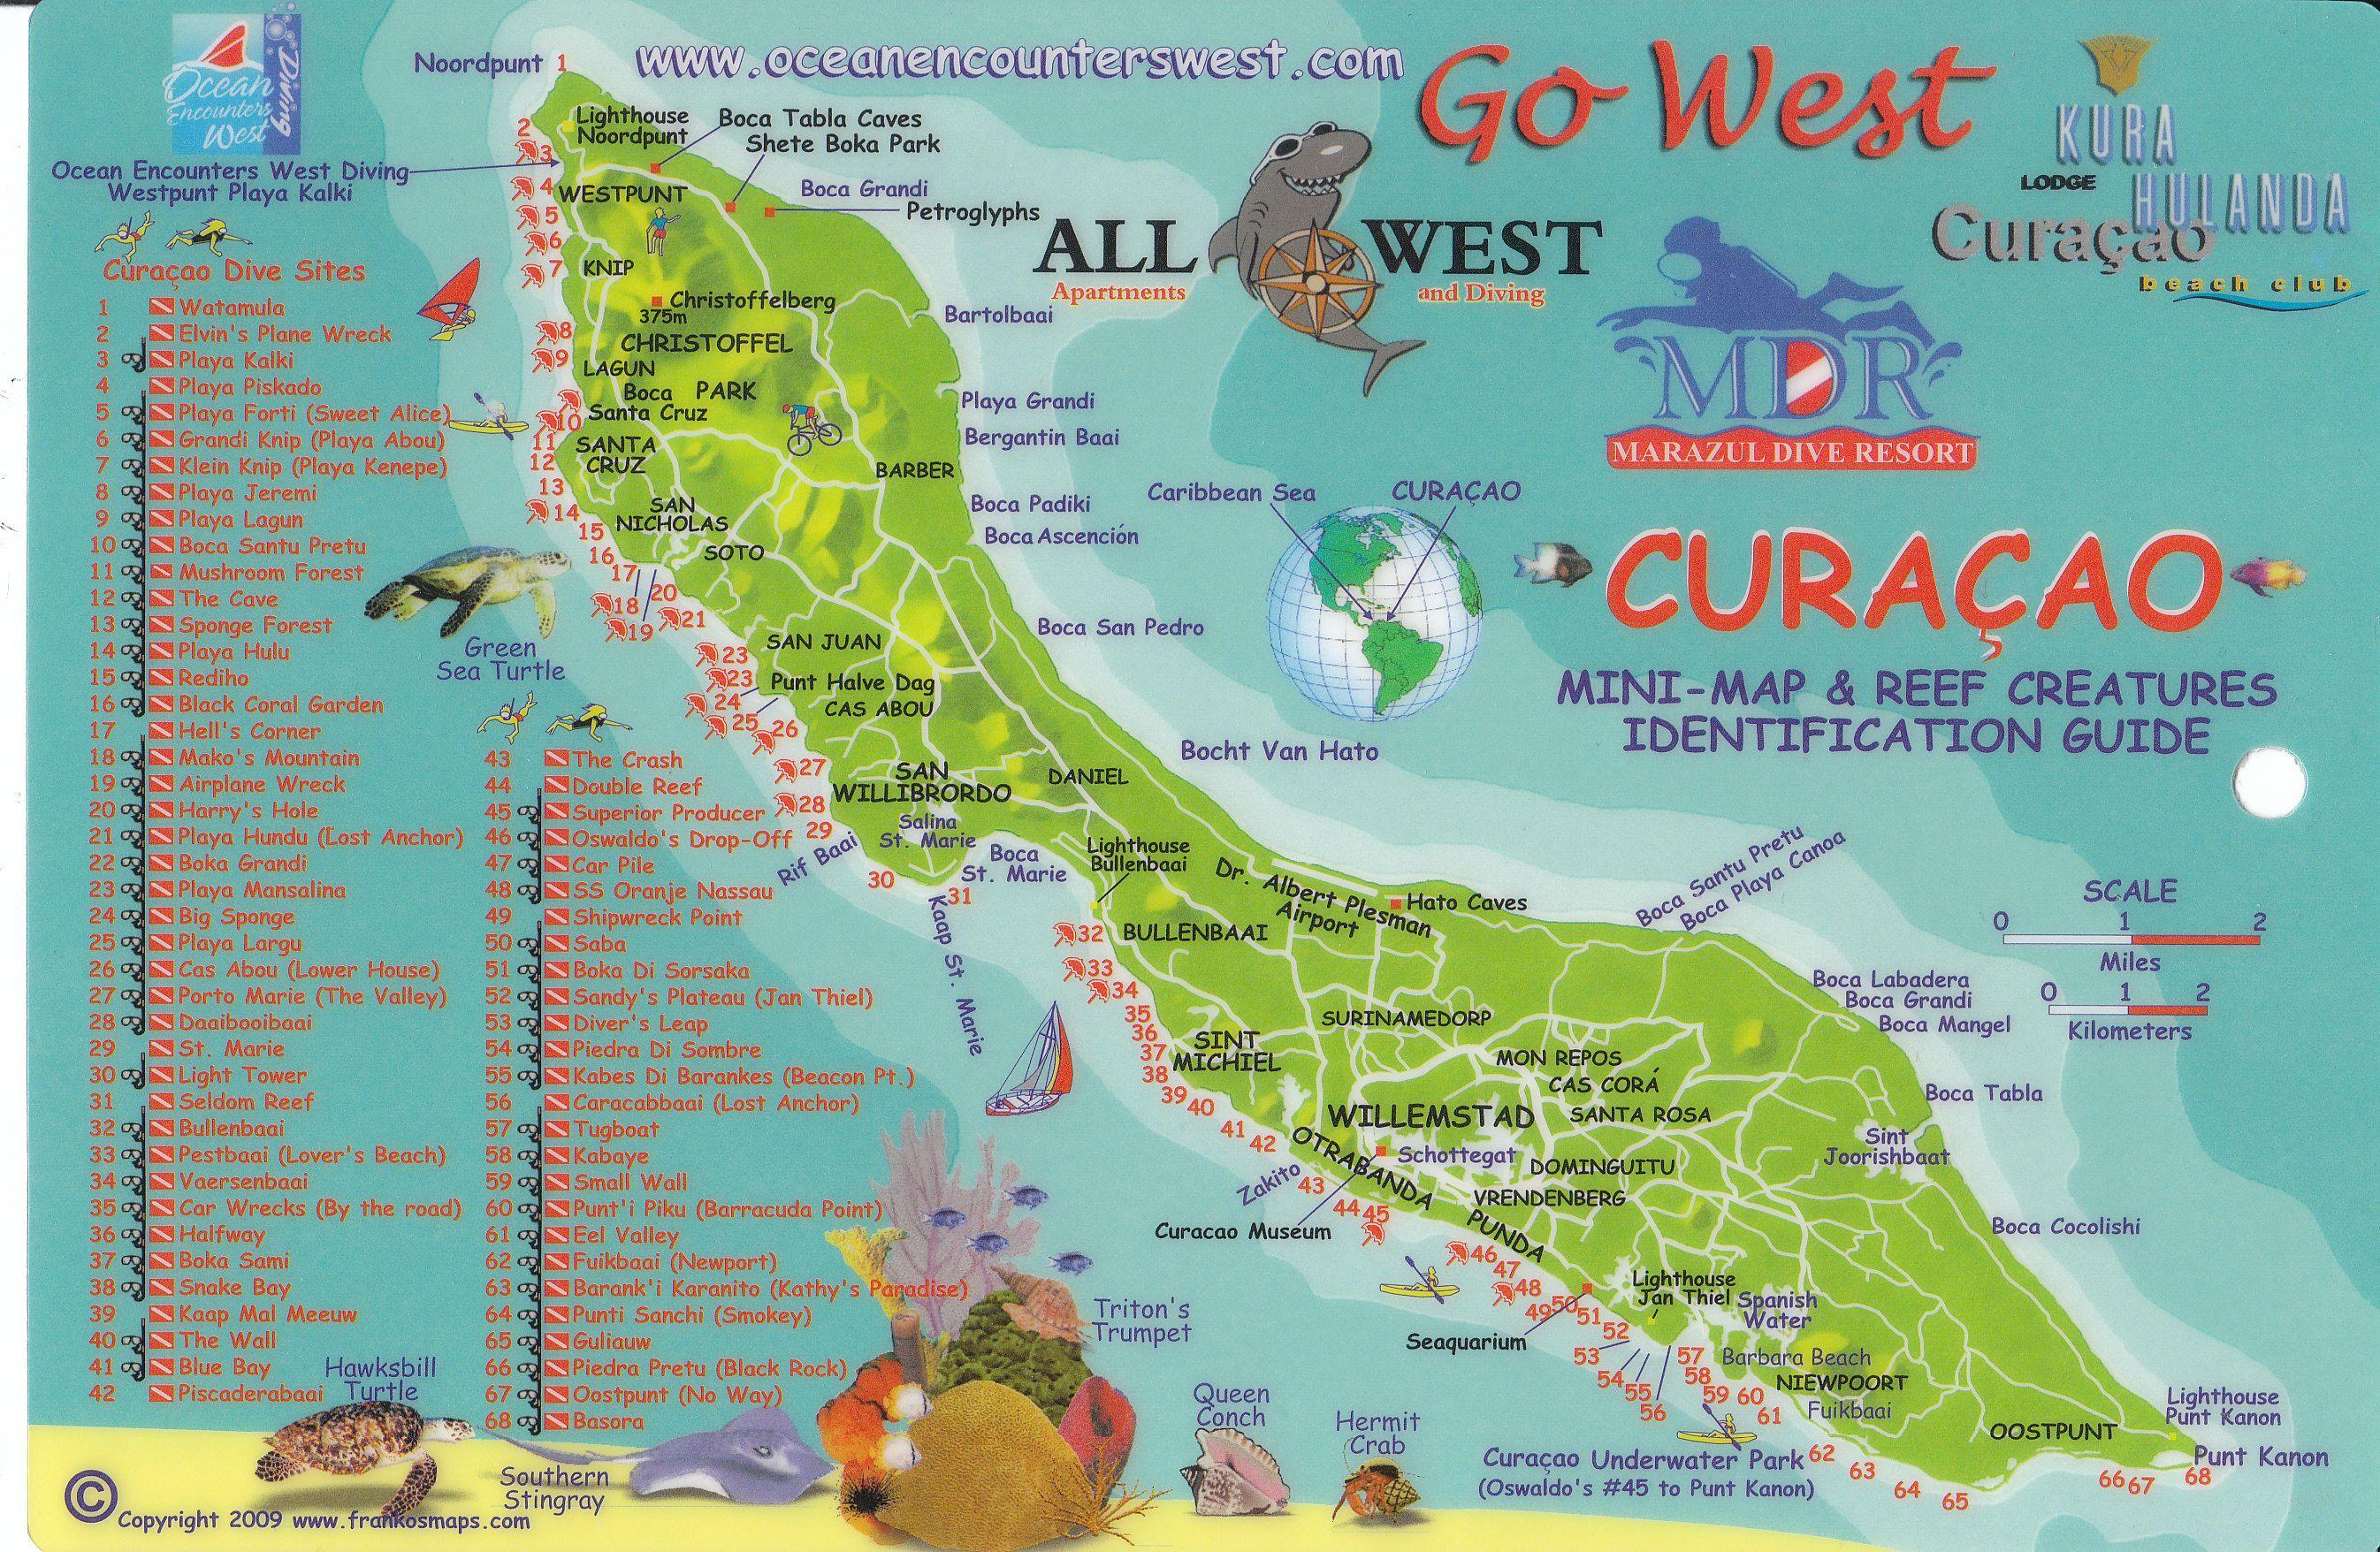 Curacaodivemapjpg 26921756 pixels Vaca Curacao Pinterest